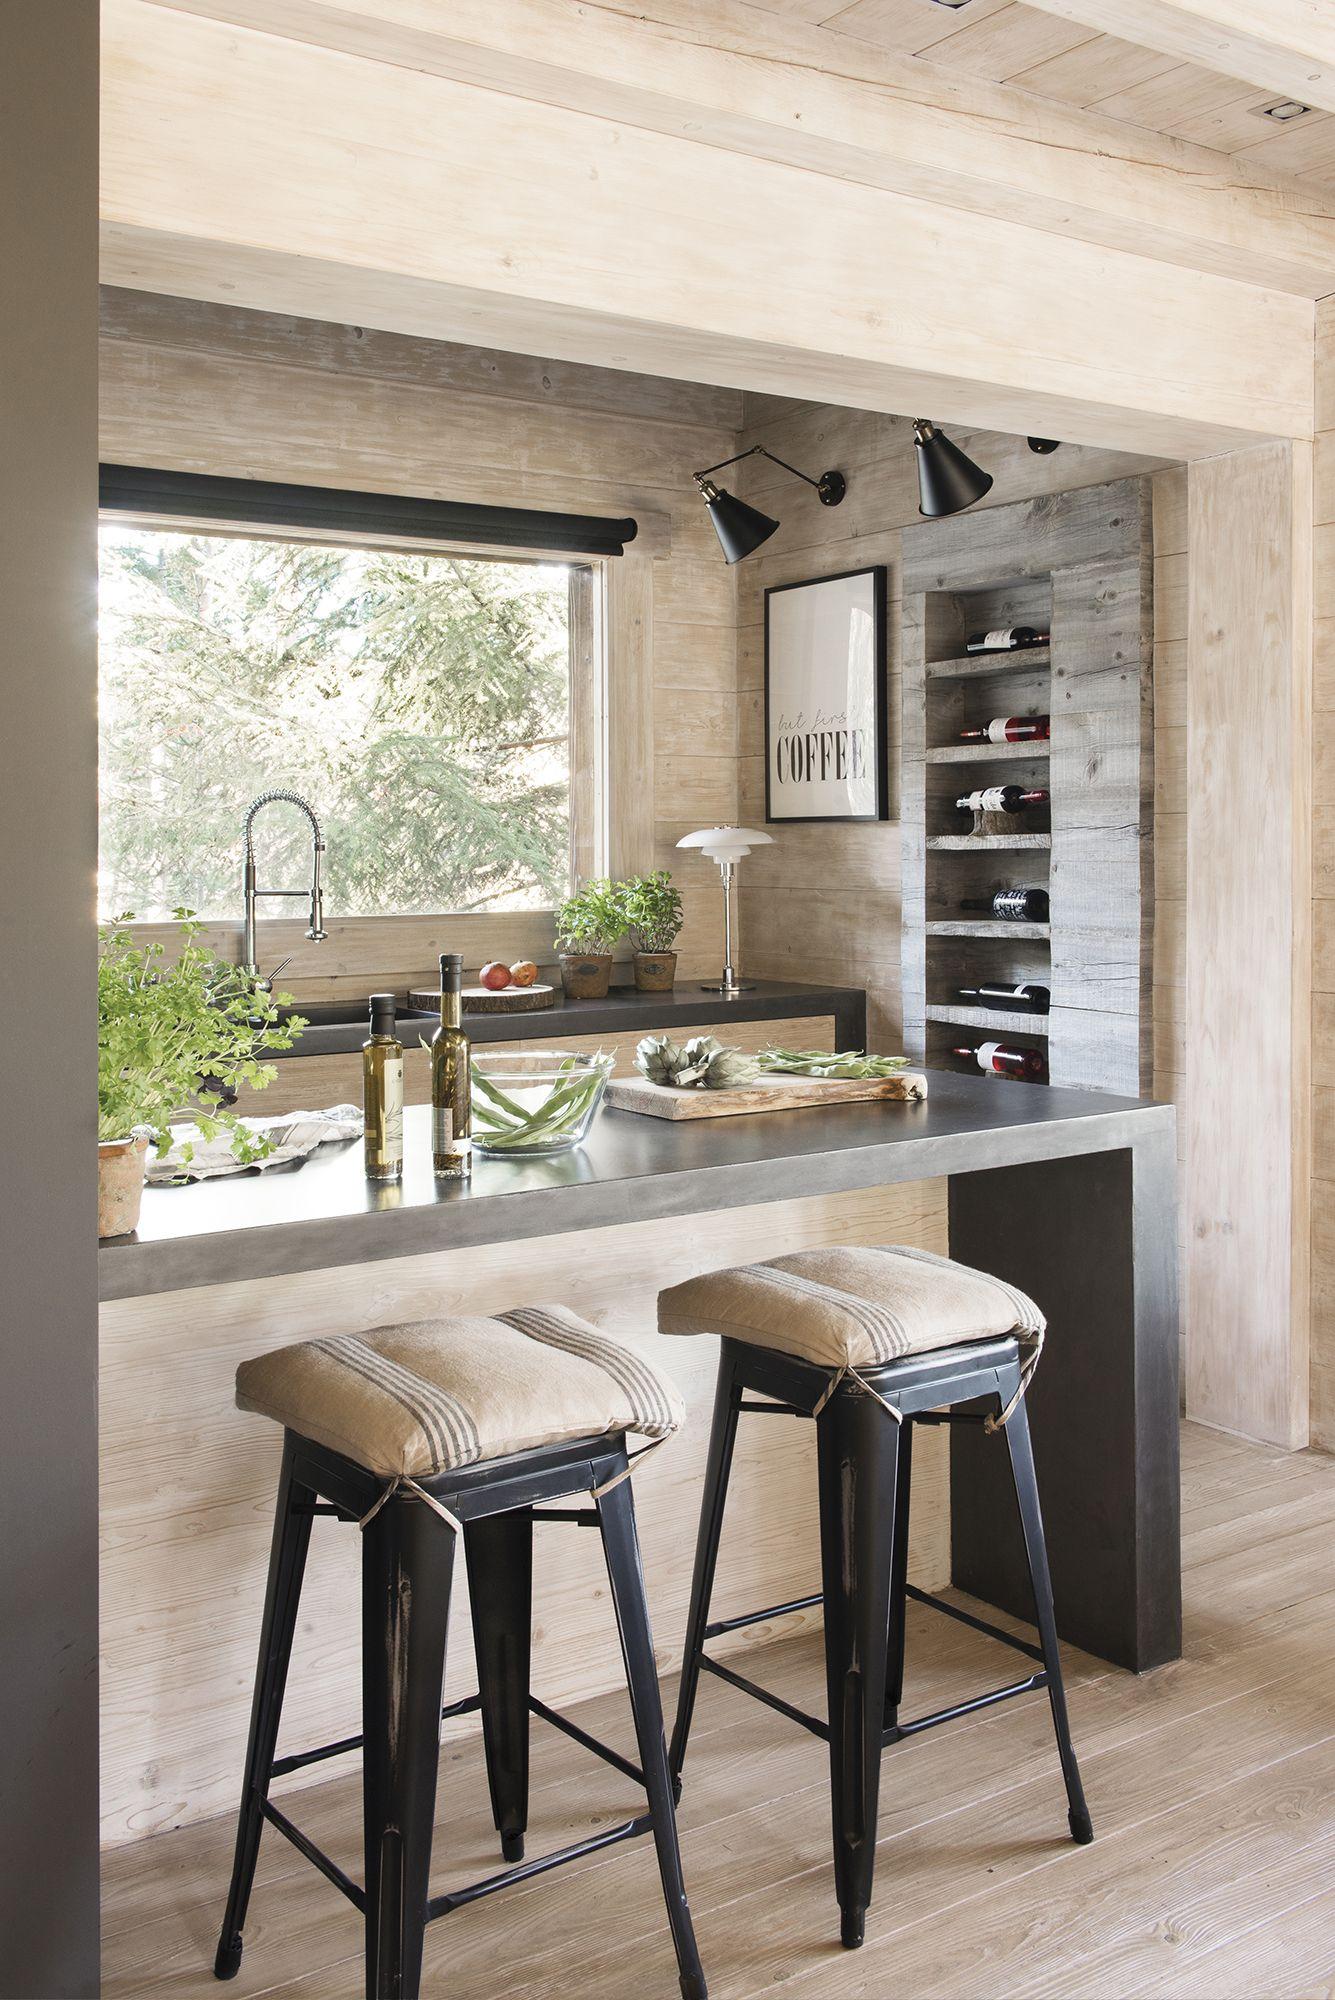 Una cocina con barra  Maison bois, Separation cuisine salon